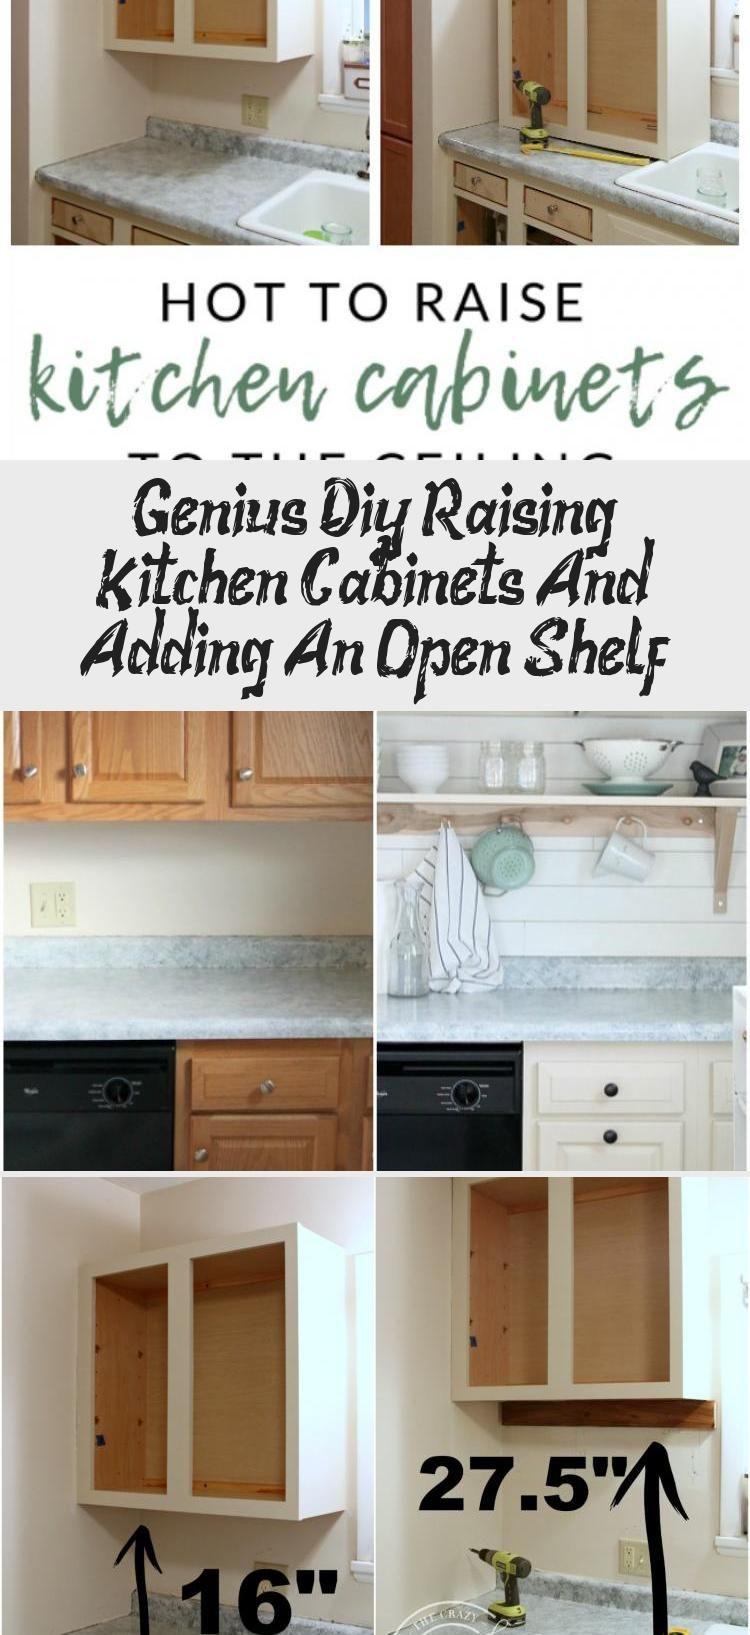 Genius Diy Raising Kitchen Cabinets And Adding An Open Shelf Bilgi Tahtasi In 2020 Small Kitchen Storage Diy Small Kitchen Decor Kitchen Storage Shelves